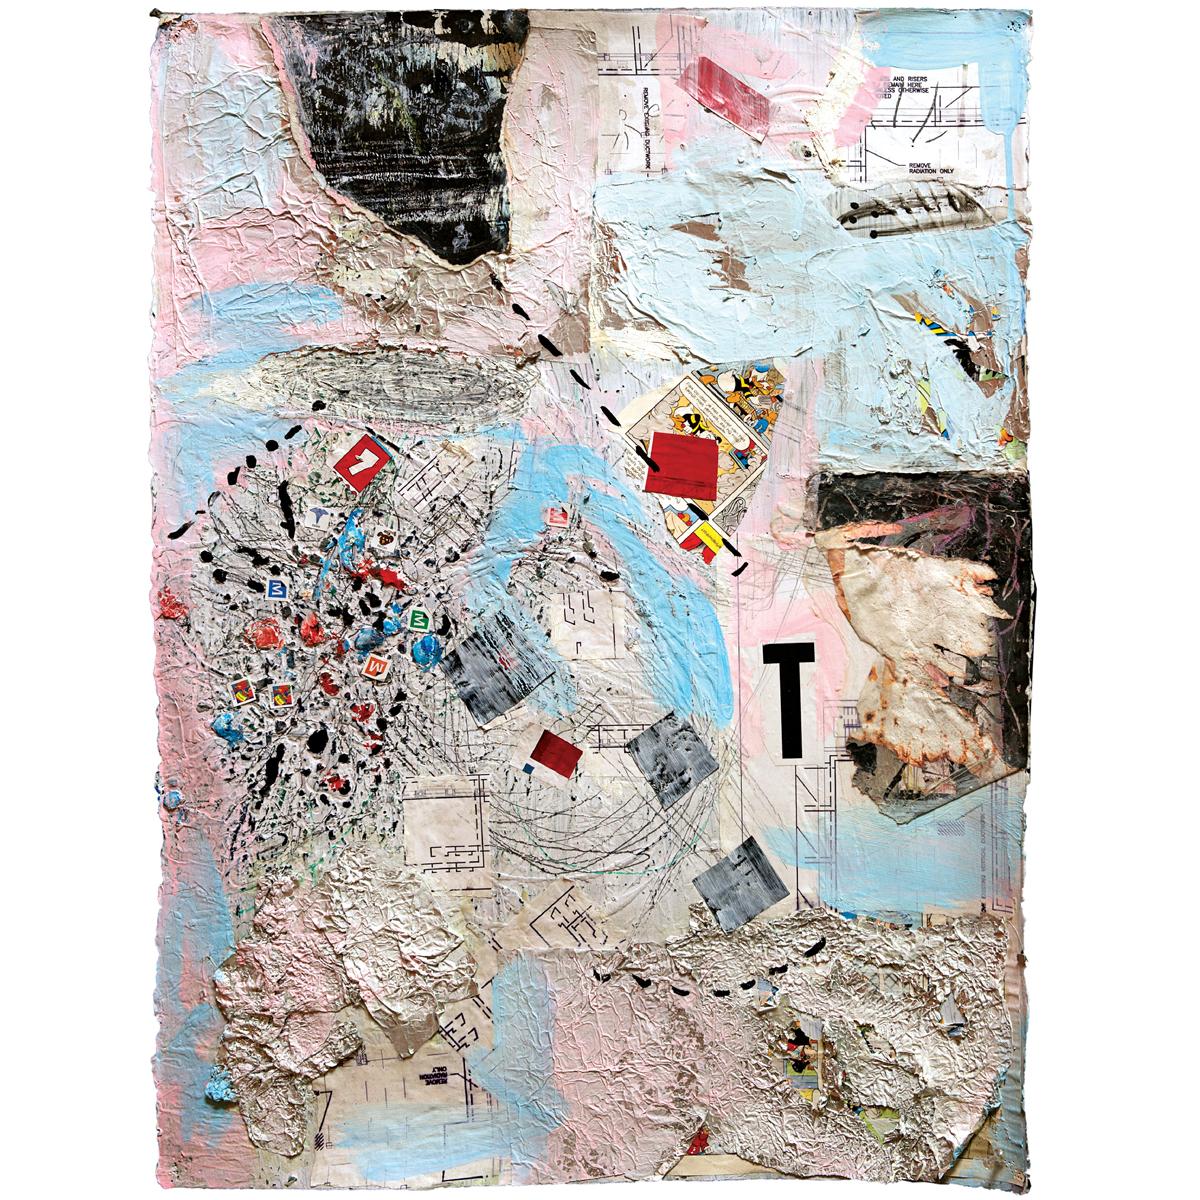 michael-mullaney-south-boston-artist-transit